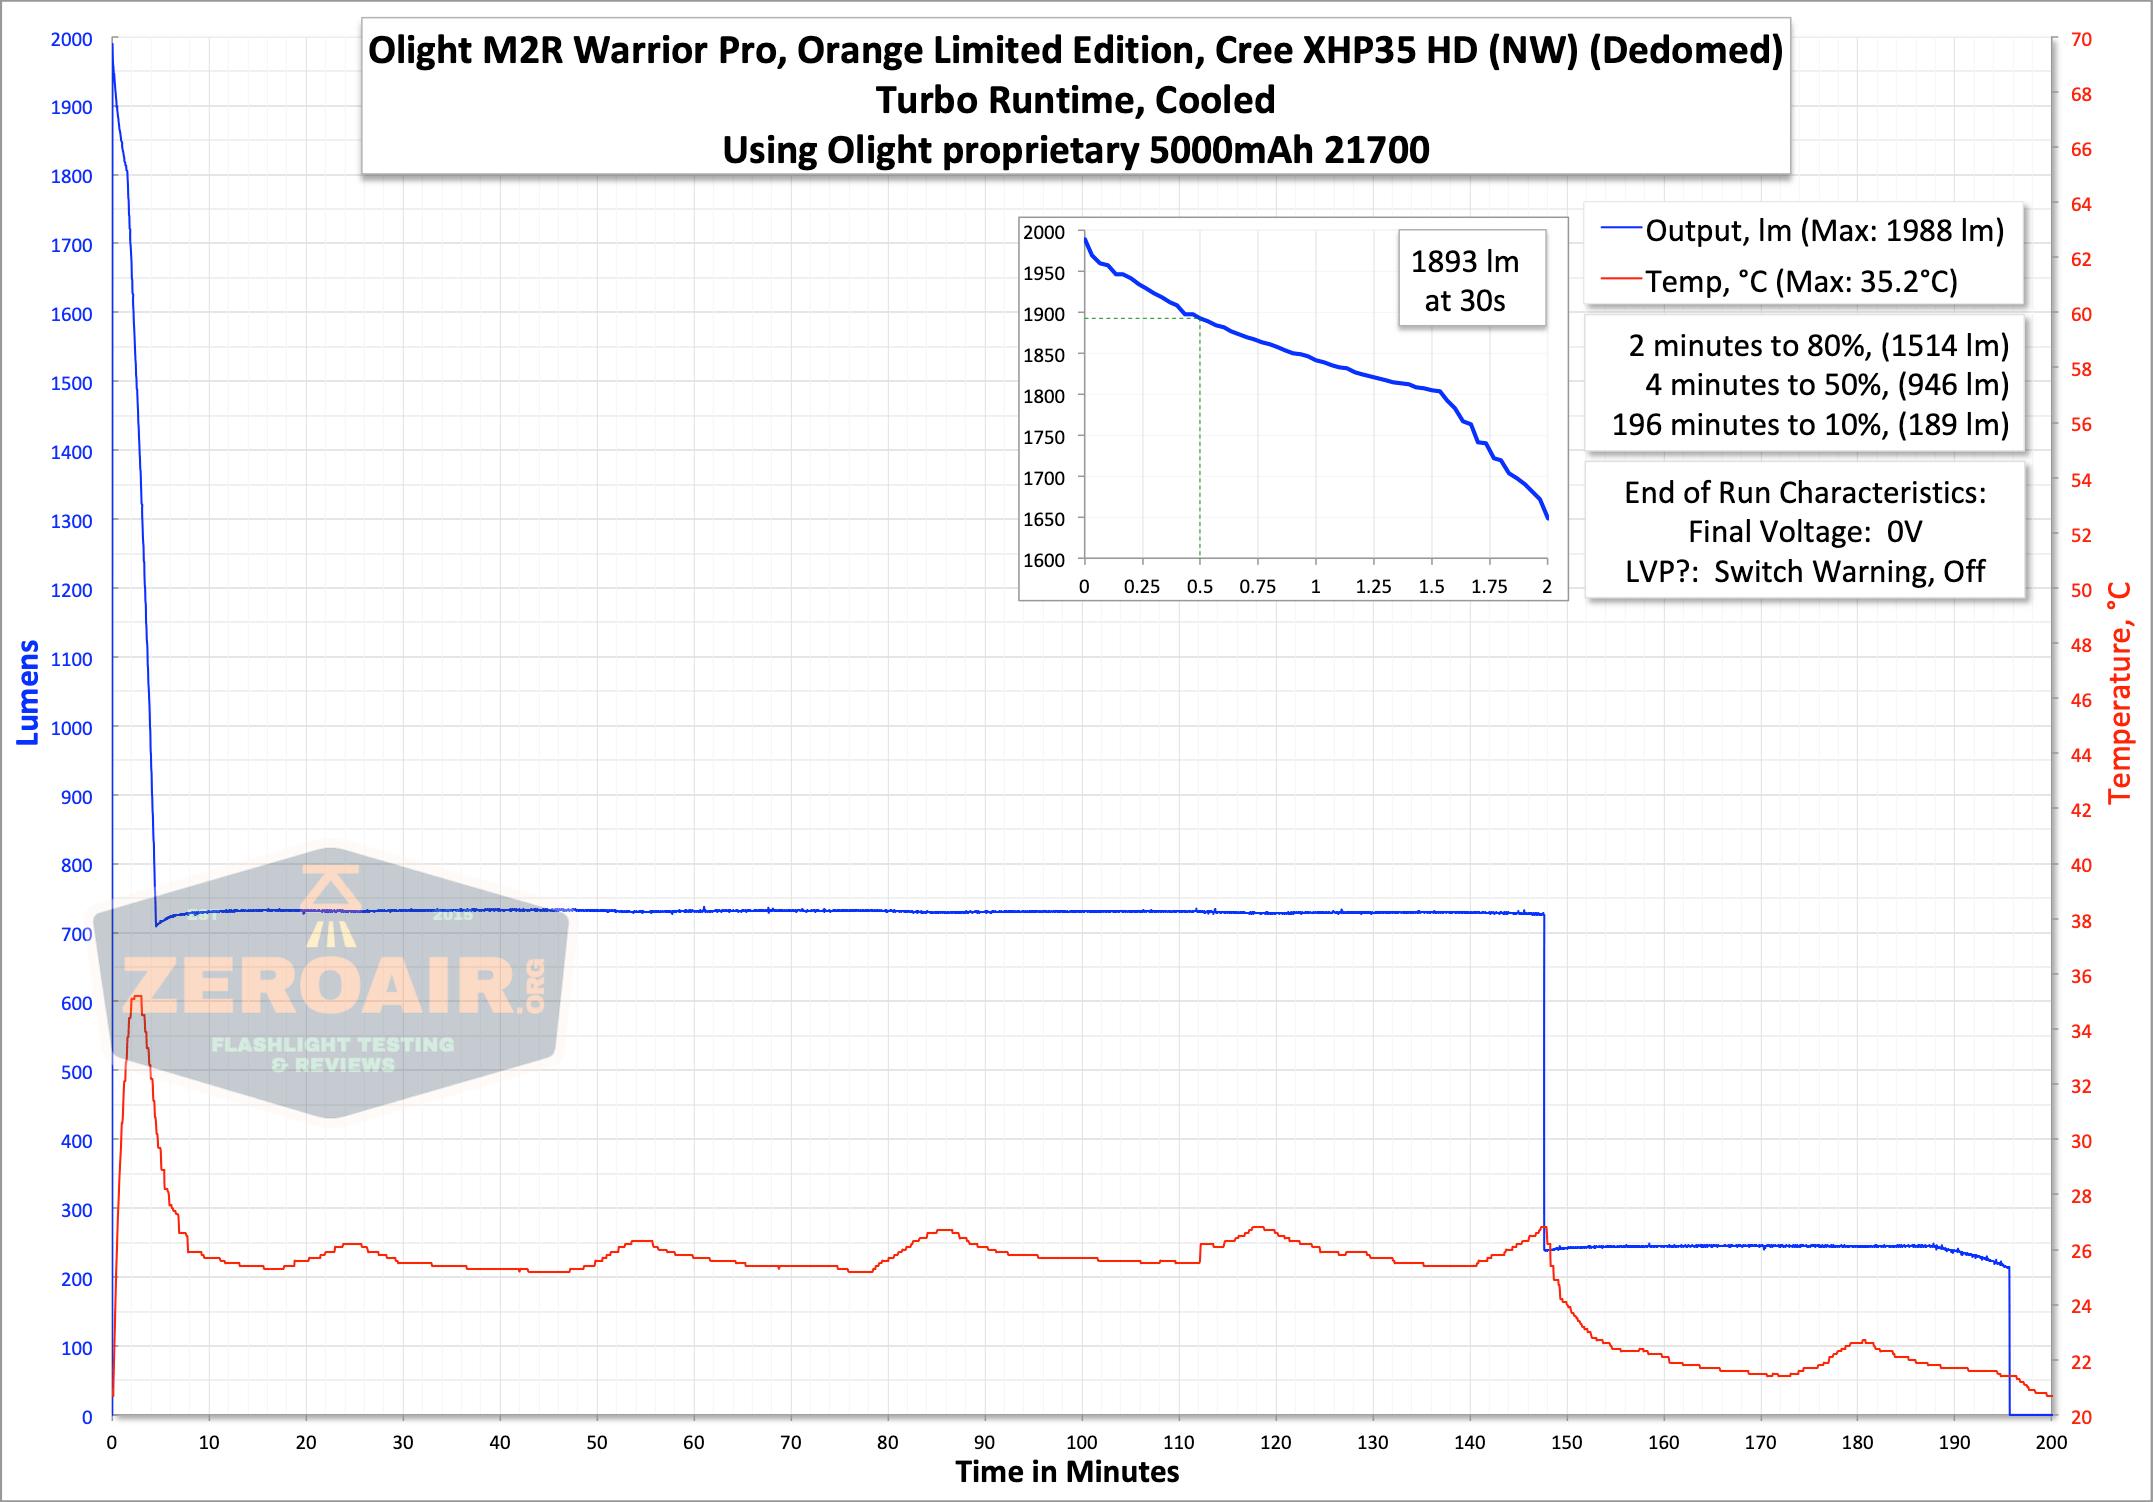 Olight m2r pro warrior runtime graph turbo